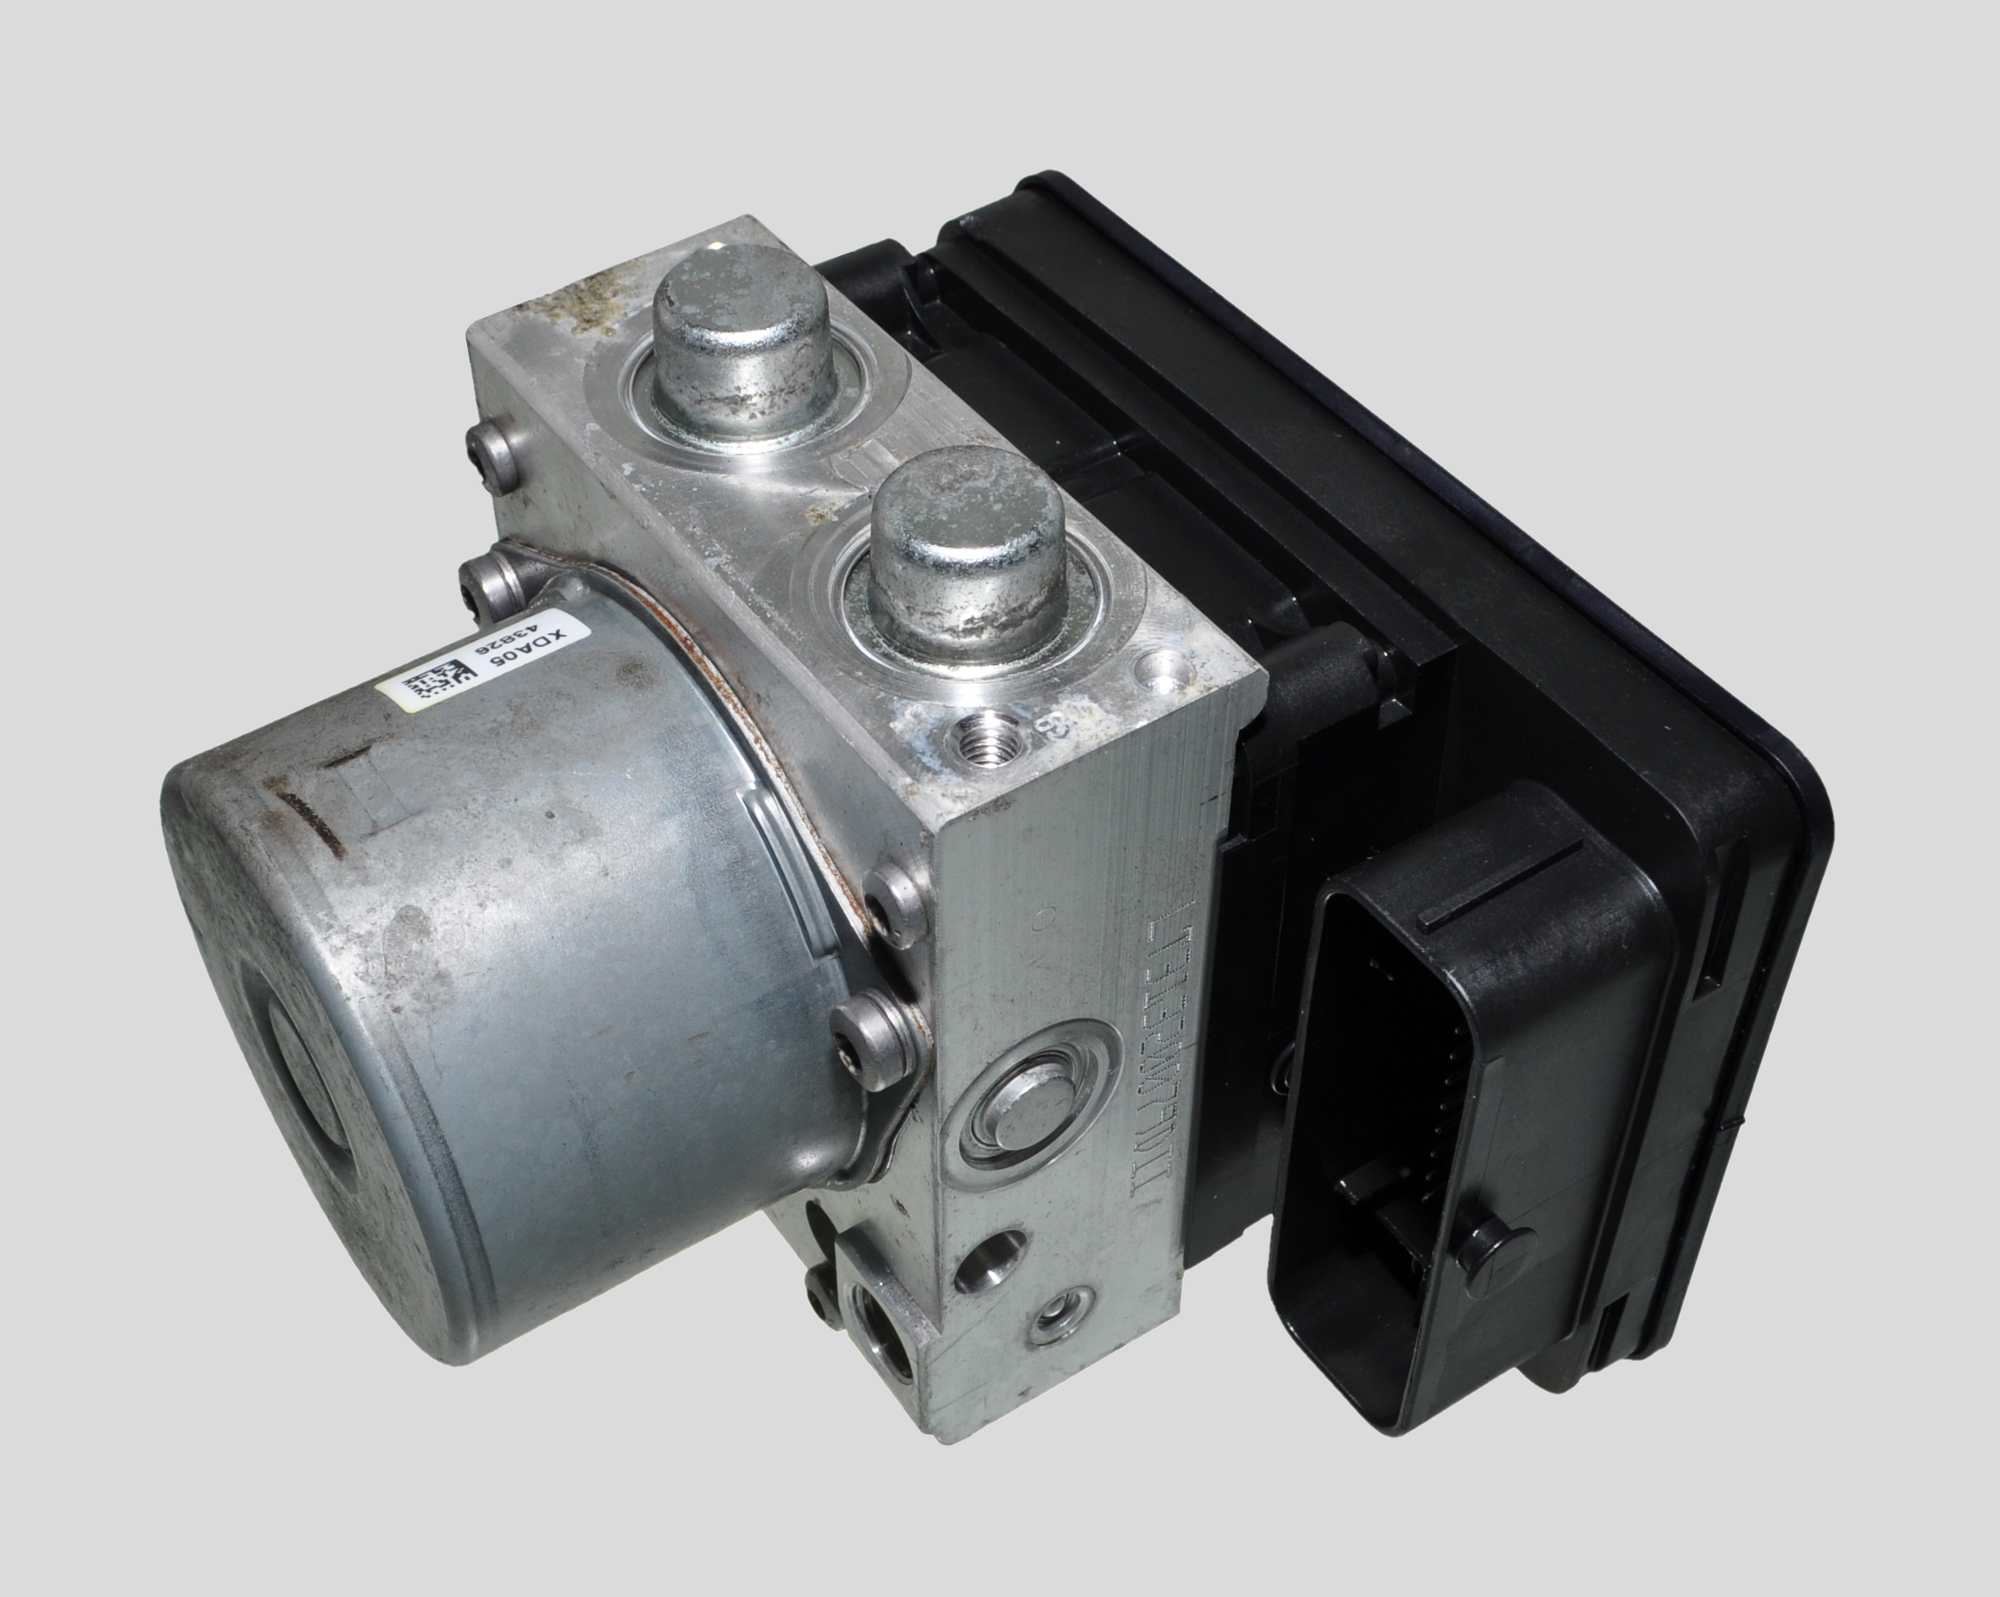 Skoda Citigo Original ABS Einheit Hydraulikblock Steuergerät 1S0614517E TRW